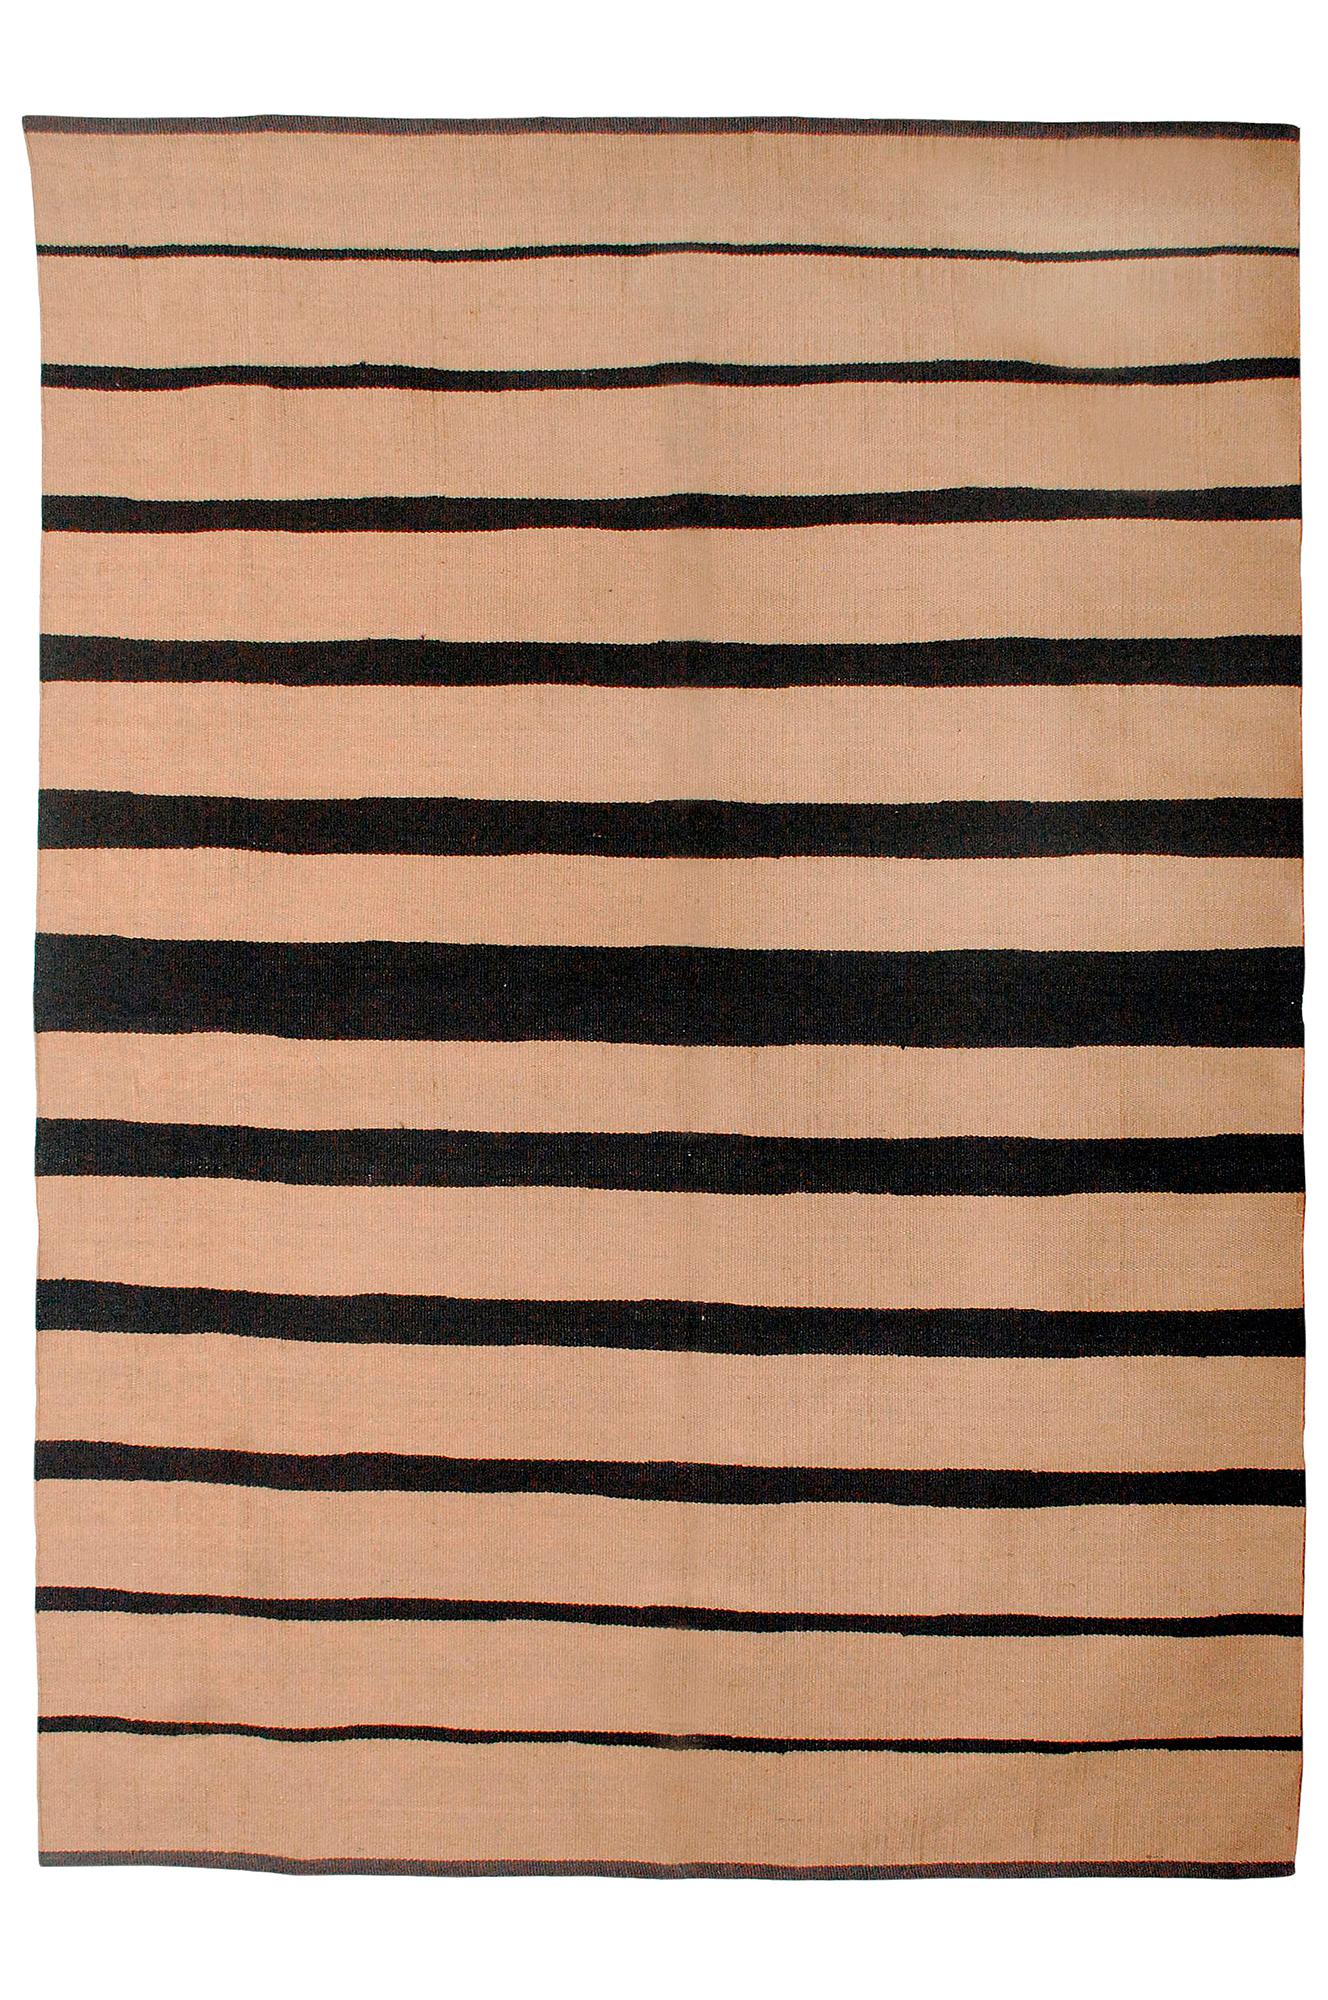 Roppongi-matto 200x300 cm